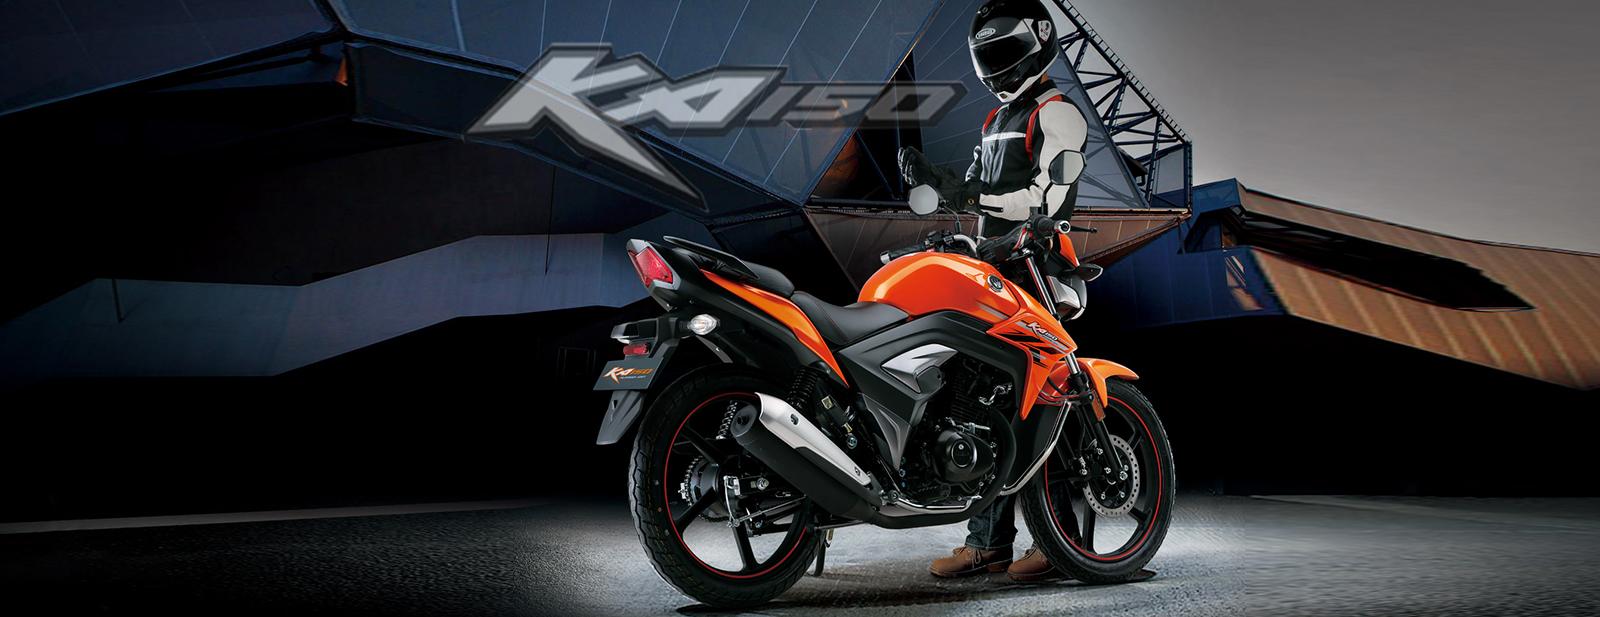 Motos-slider-KA-150-1600-x-617